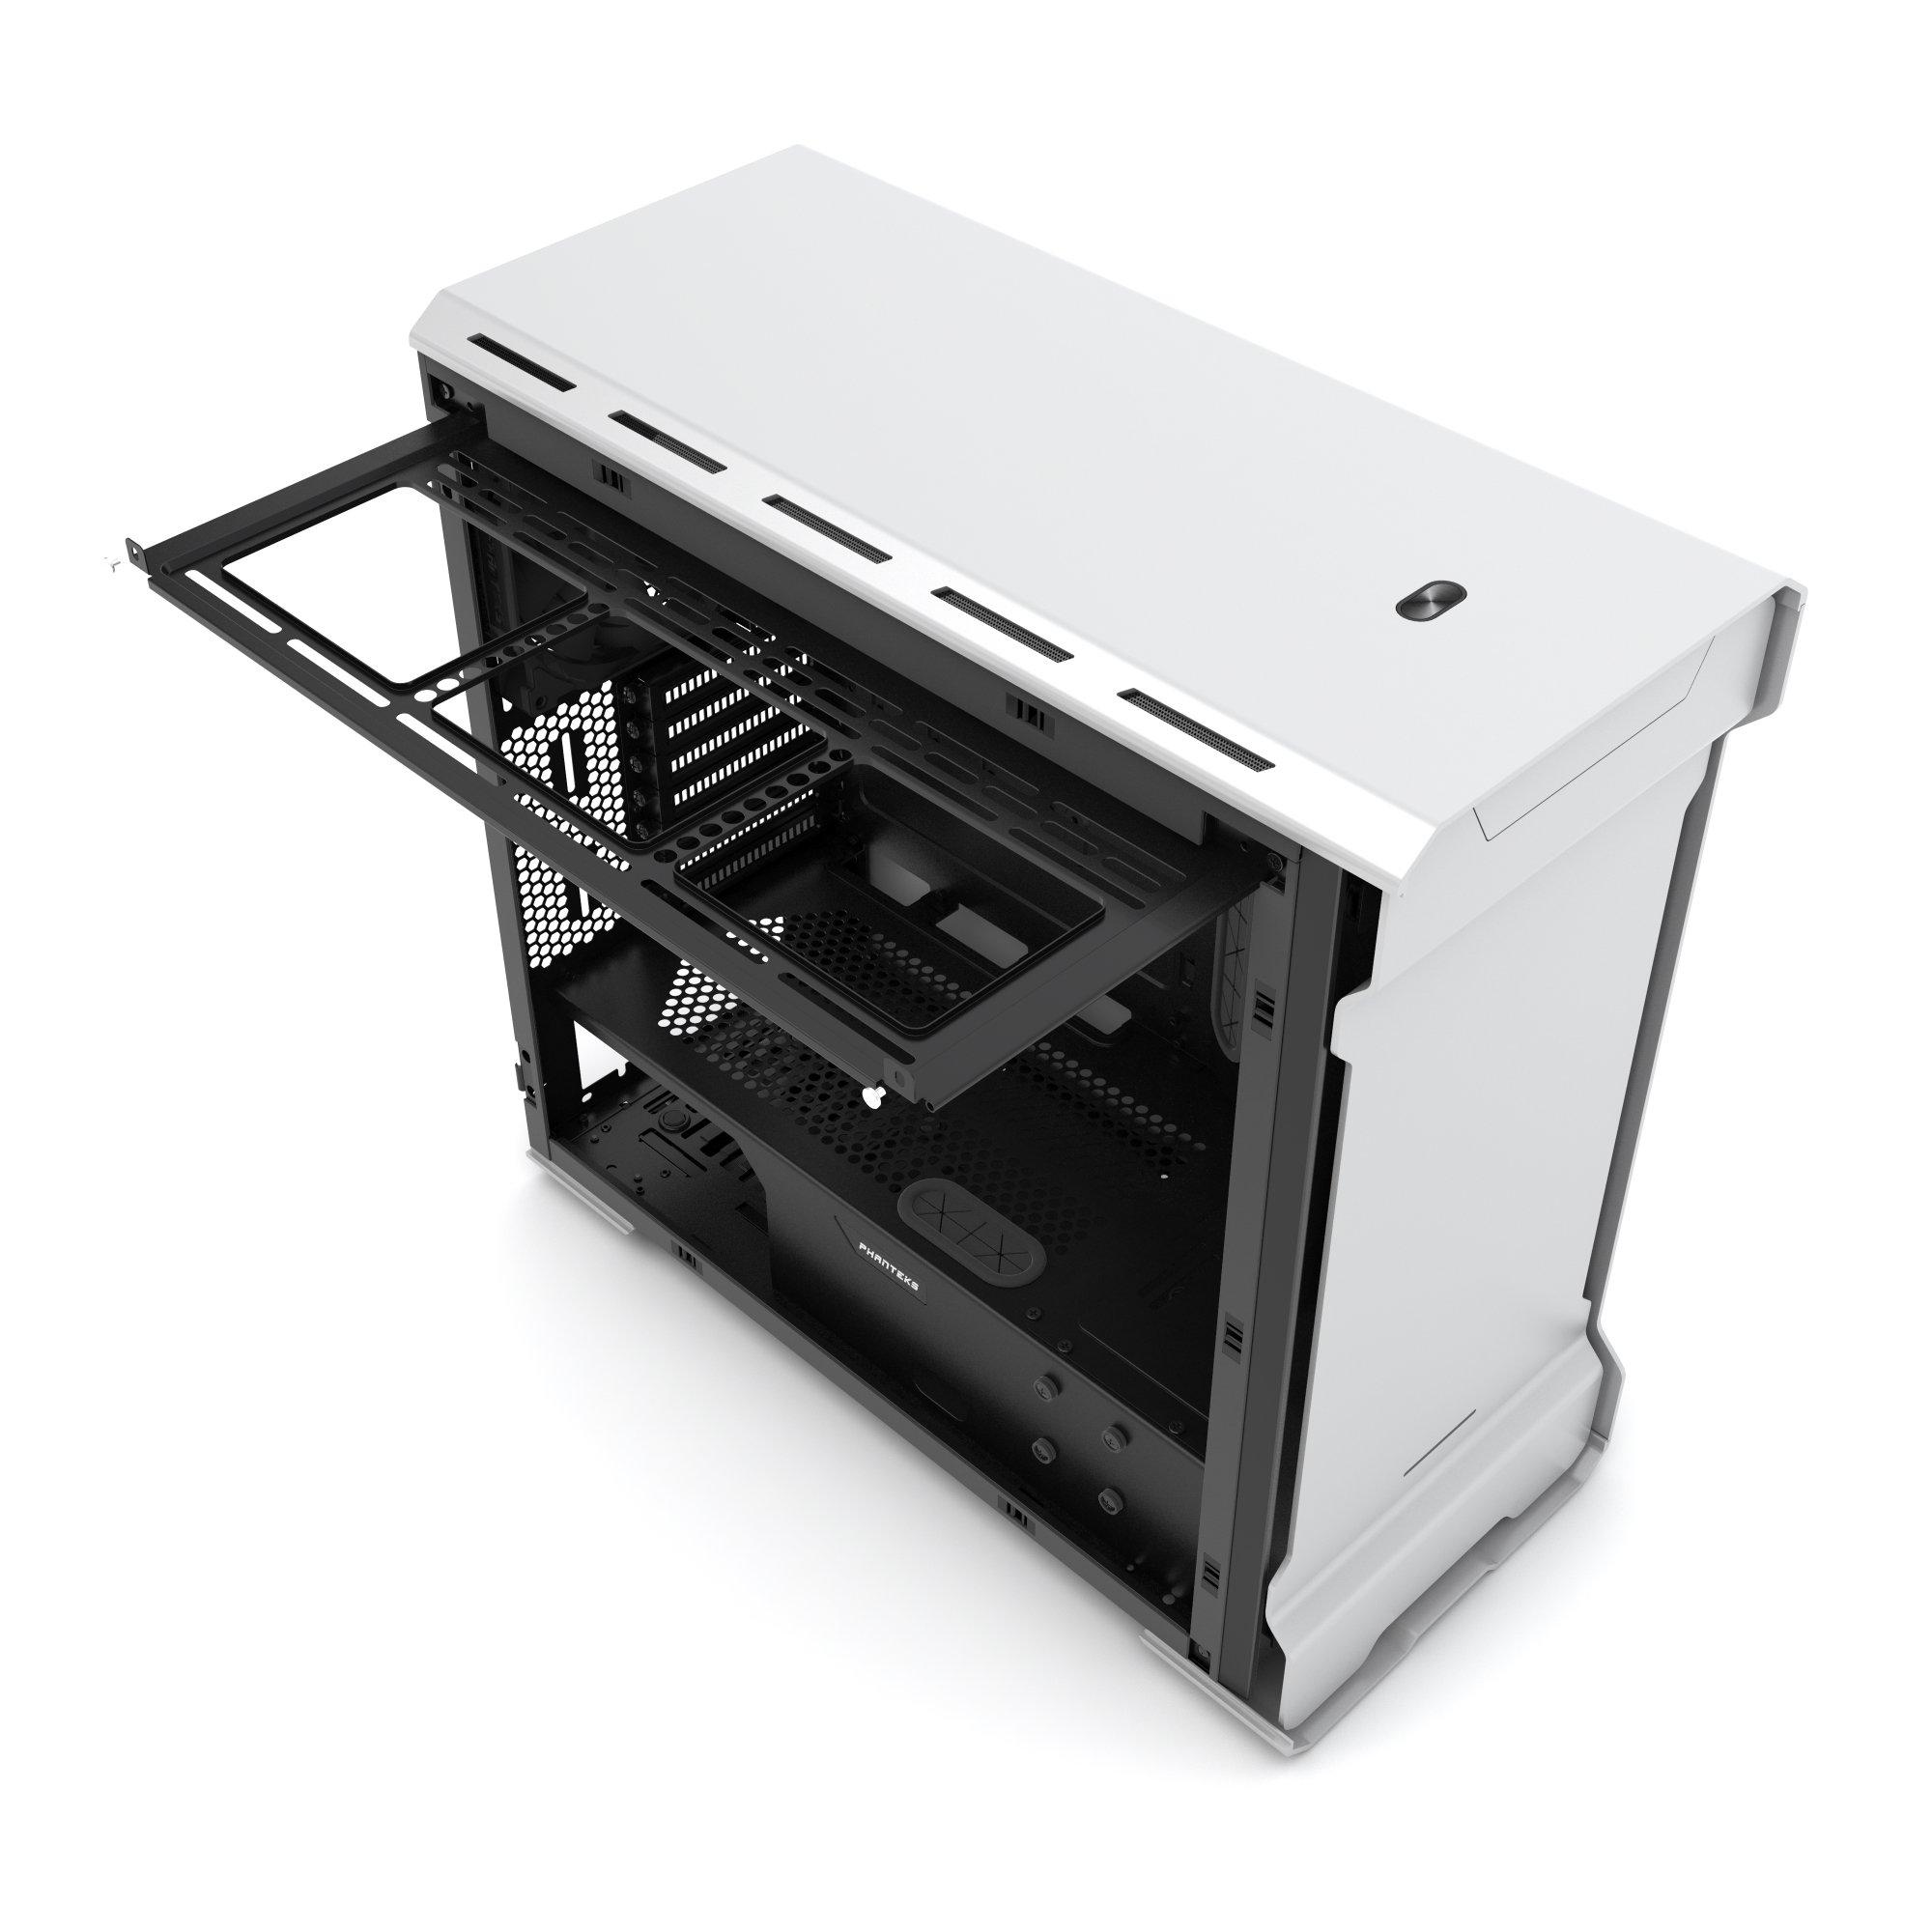 Phanteks Enthoo Evolv ATX Alum/Steel Tower Computer Case, Window (PH-ES515E_GS) Galaxy Silver by Phanteks (Image #7)